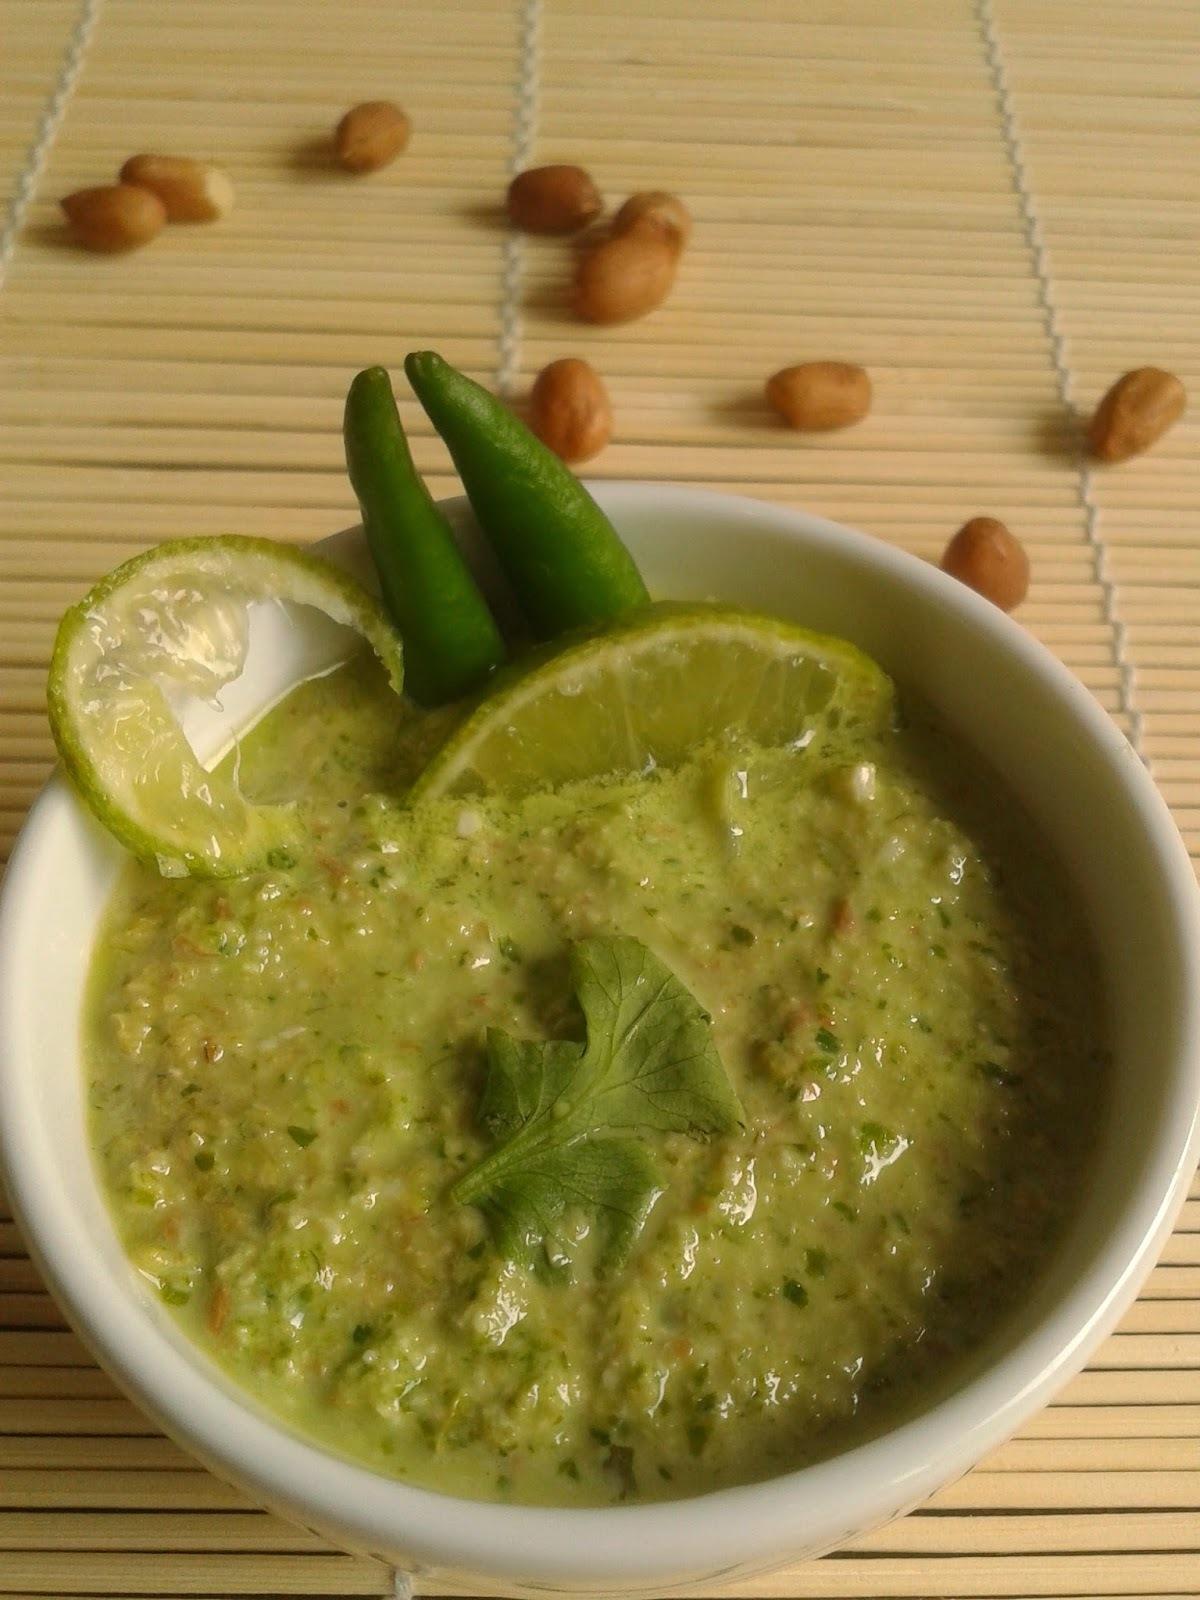 Recipe of Peanut Coriander Chutney | How to Make Peanut Coriander Chutney